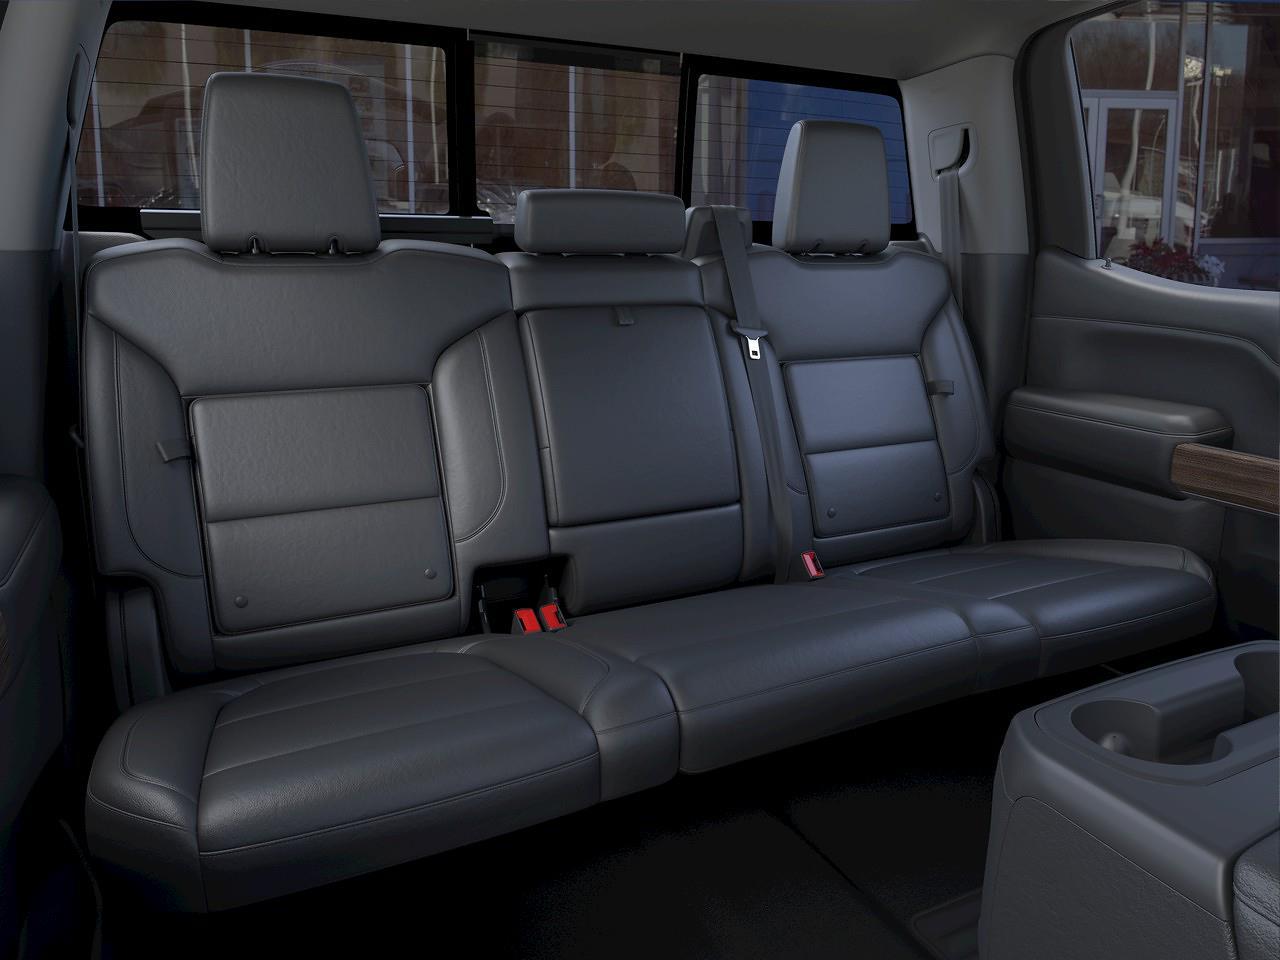 2021 Chevrolet Silverado 1500 Crew Cab 4x4, Pickup #CK1533 - photo 14